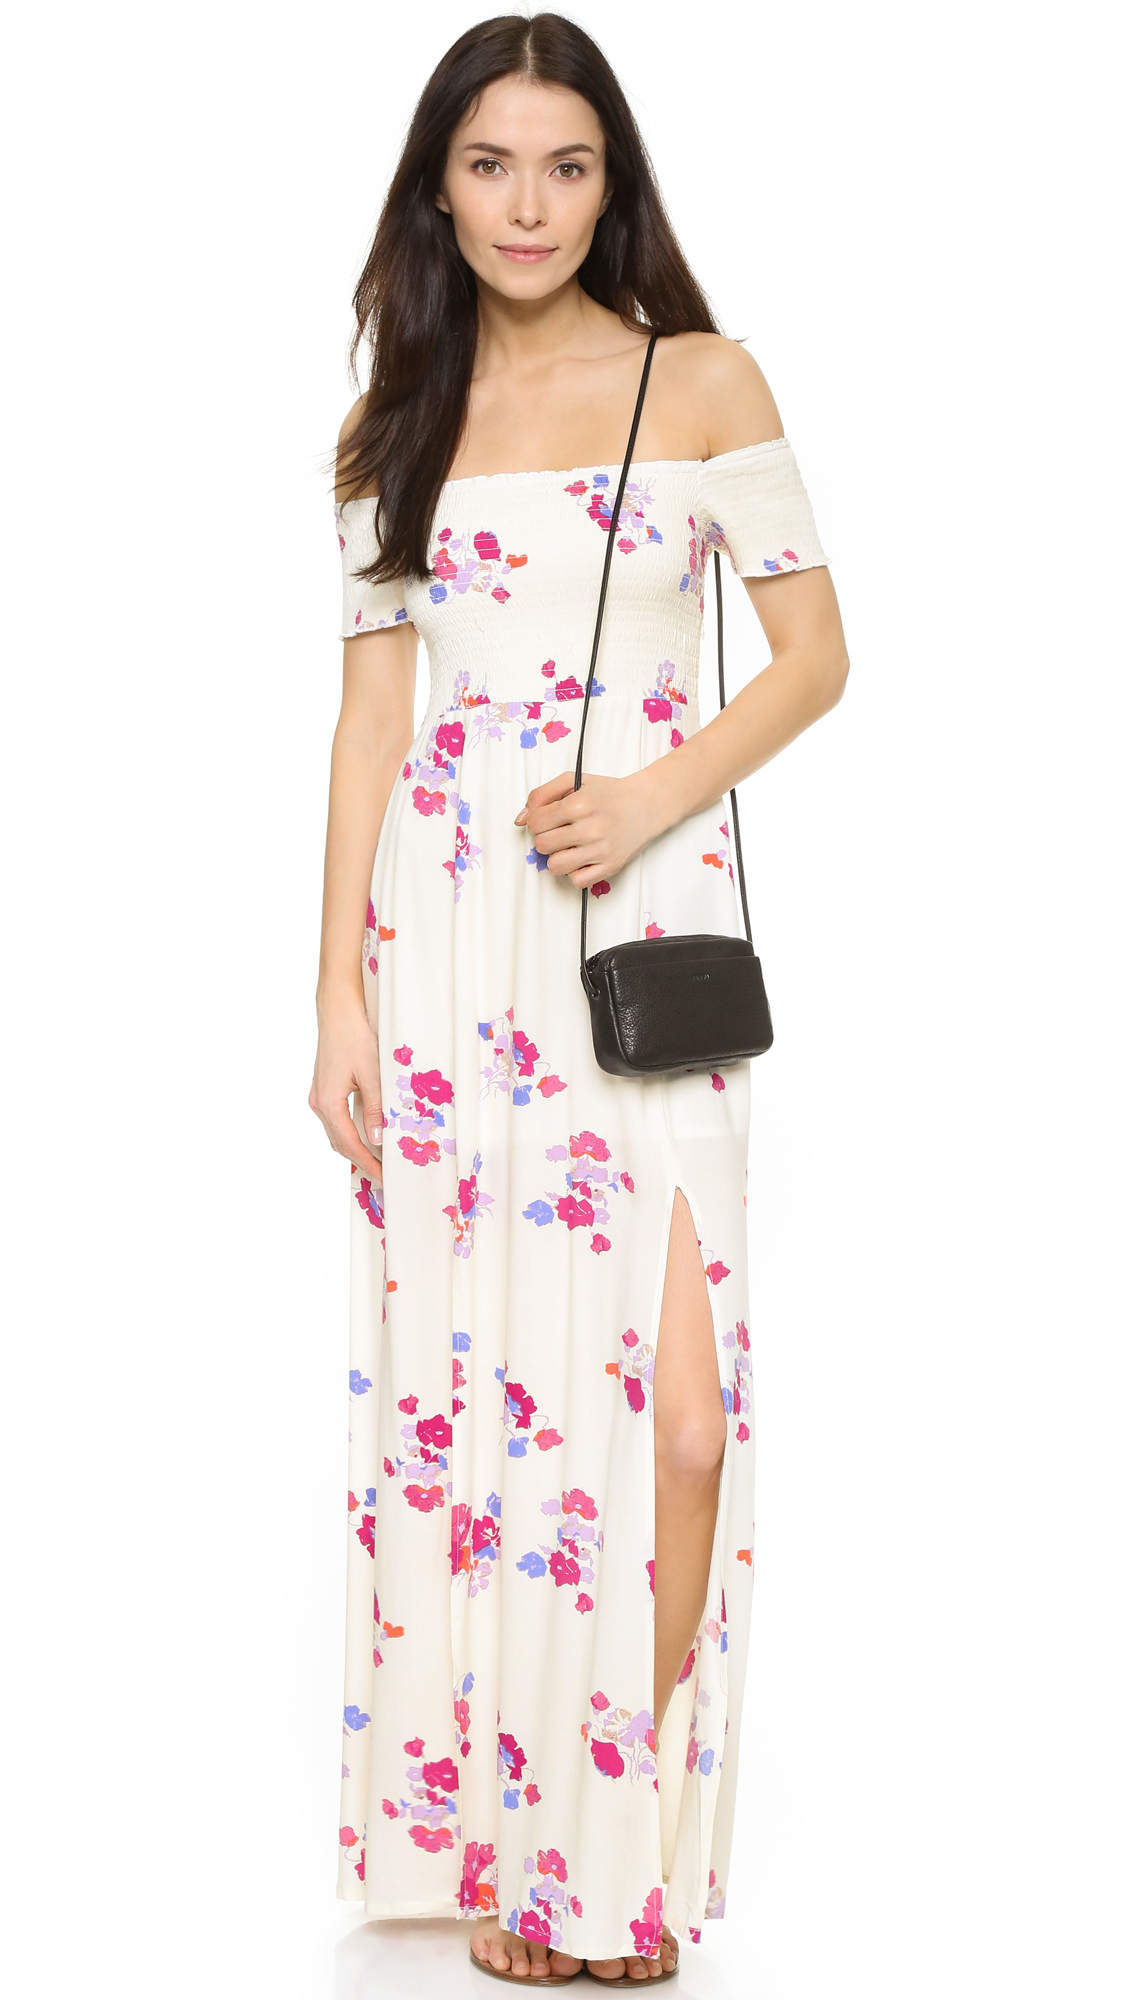 4772f8b6610 Lyst - MINKPINK Off Shoulder Maxi Dress in White